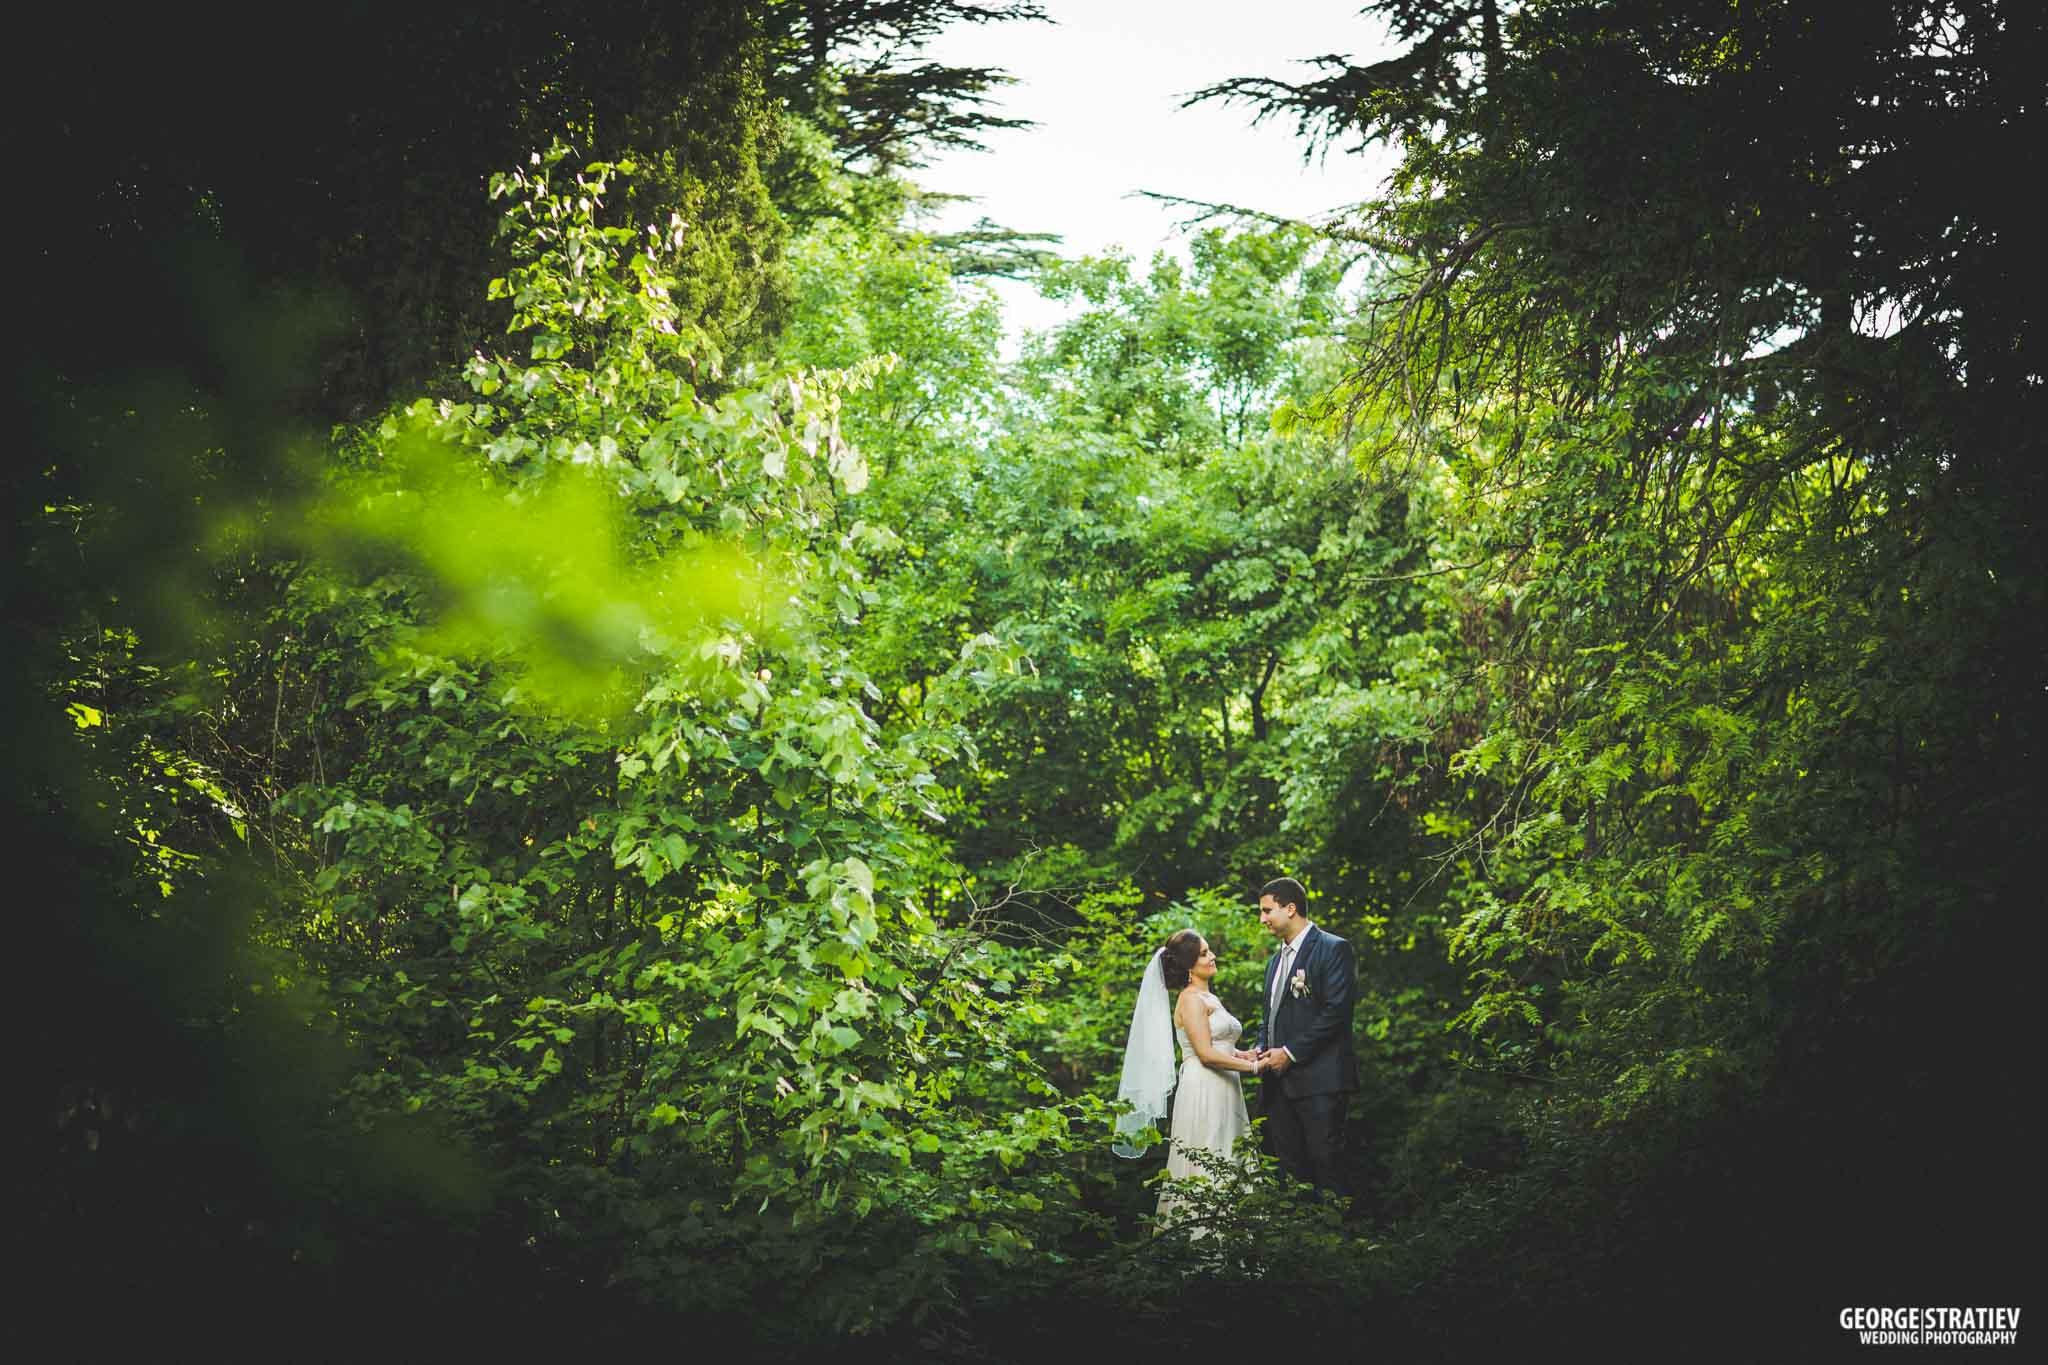 George Stratiev Photography, Wedding photograher.